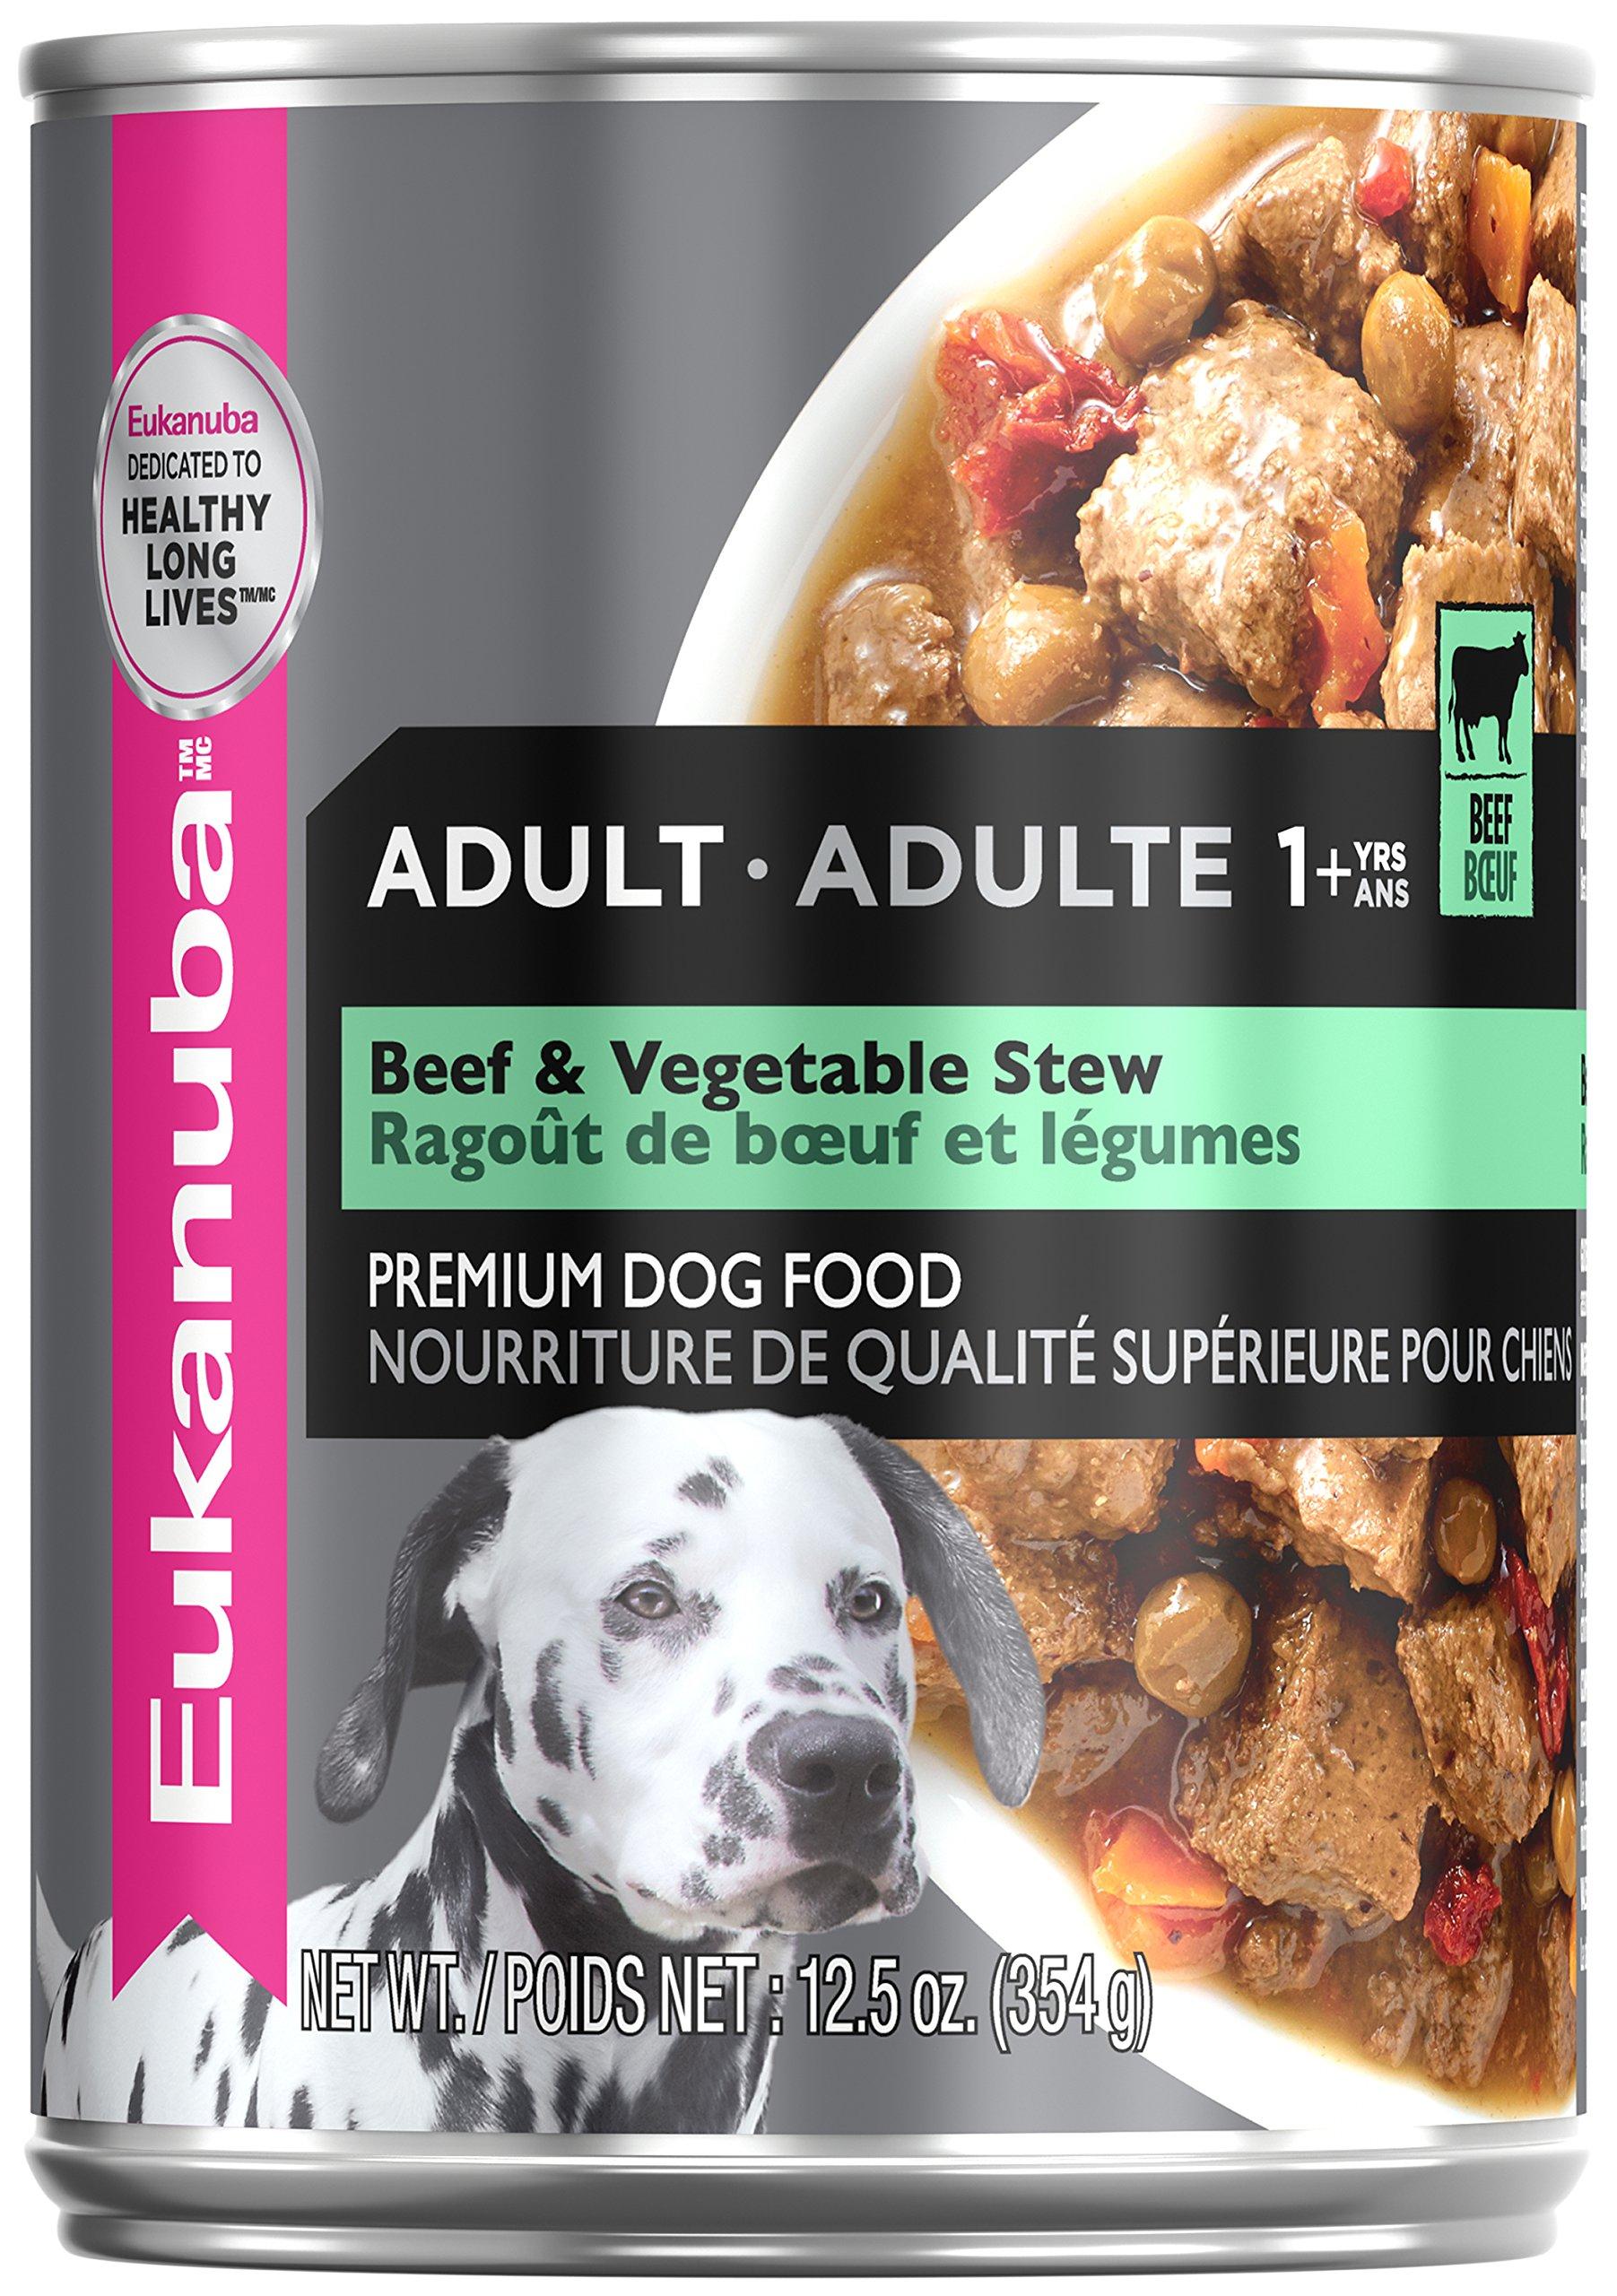 Eukanuba Wet Food 10154703 Adult Beef & Vegetable Stew Canned Dog Food (Case of 12), 12.5 oz